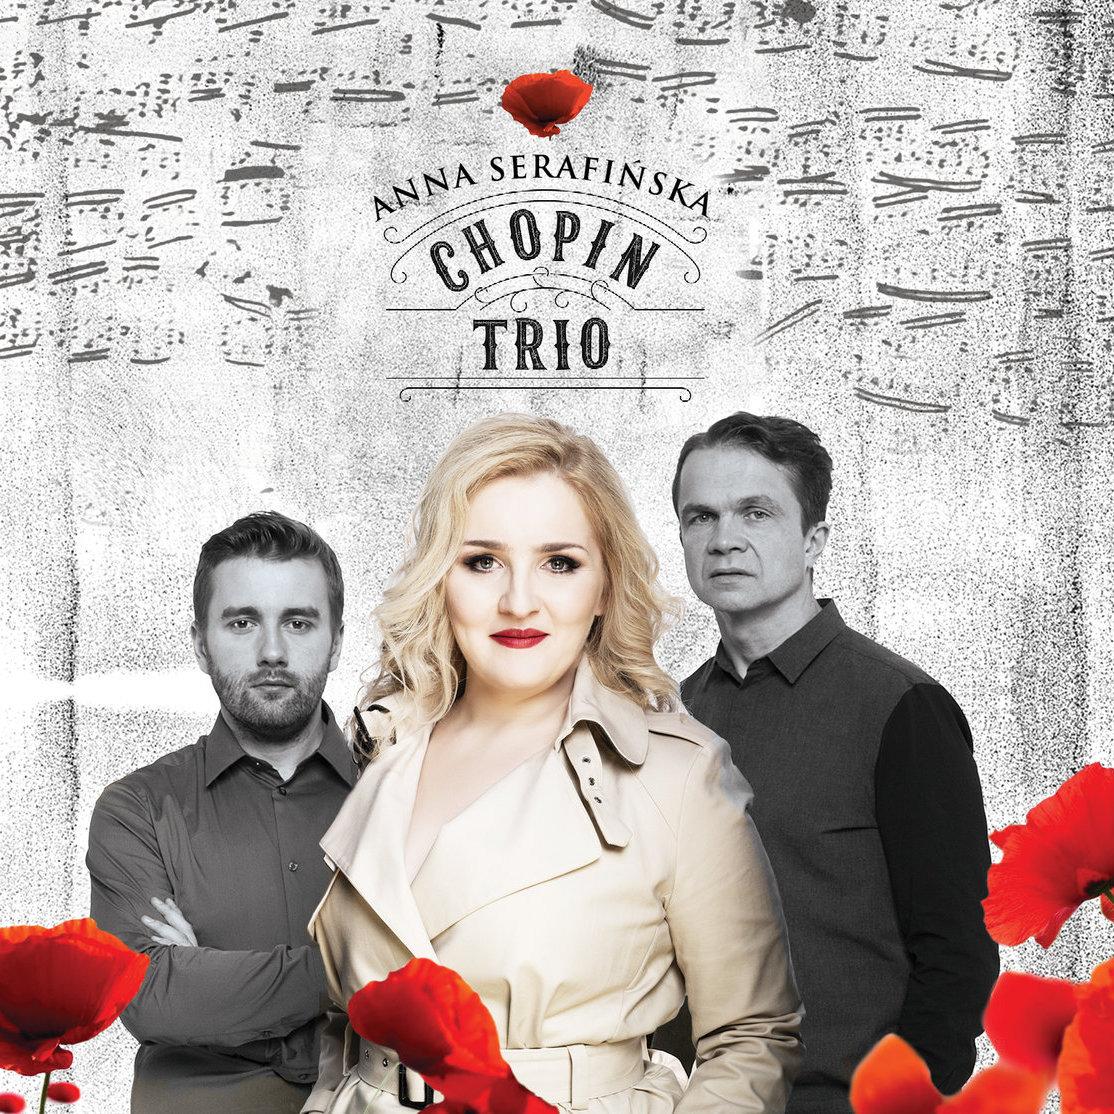 chopin-trio-b-iext51376736